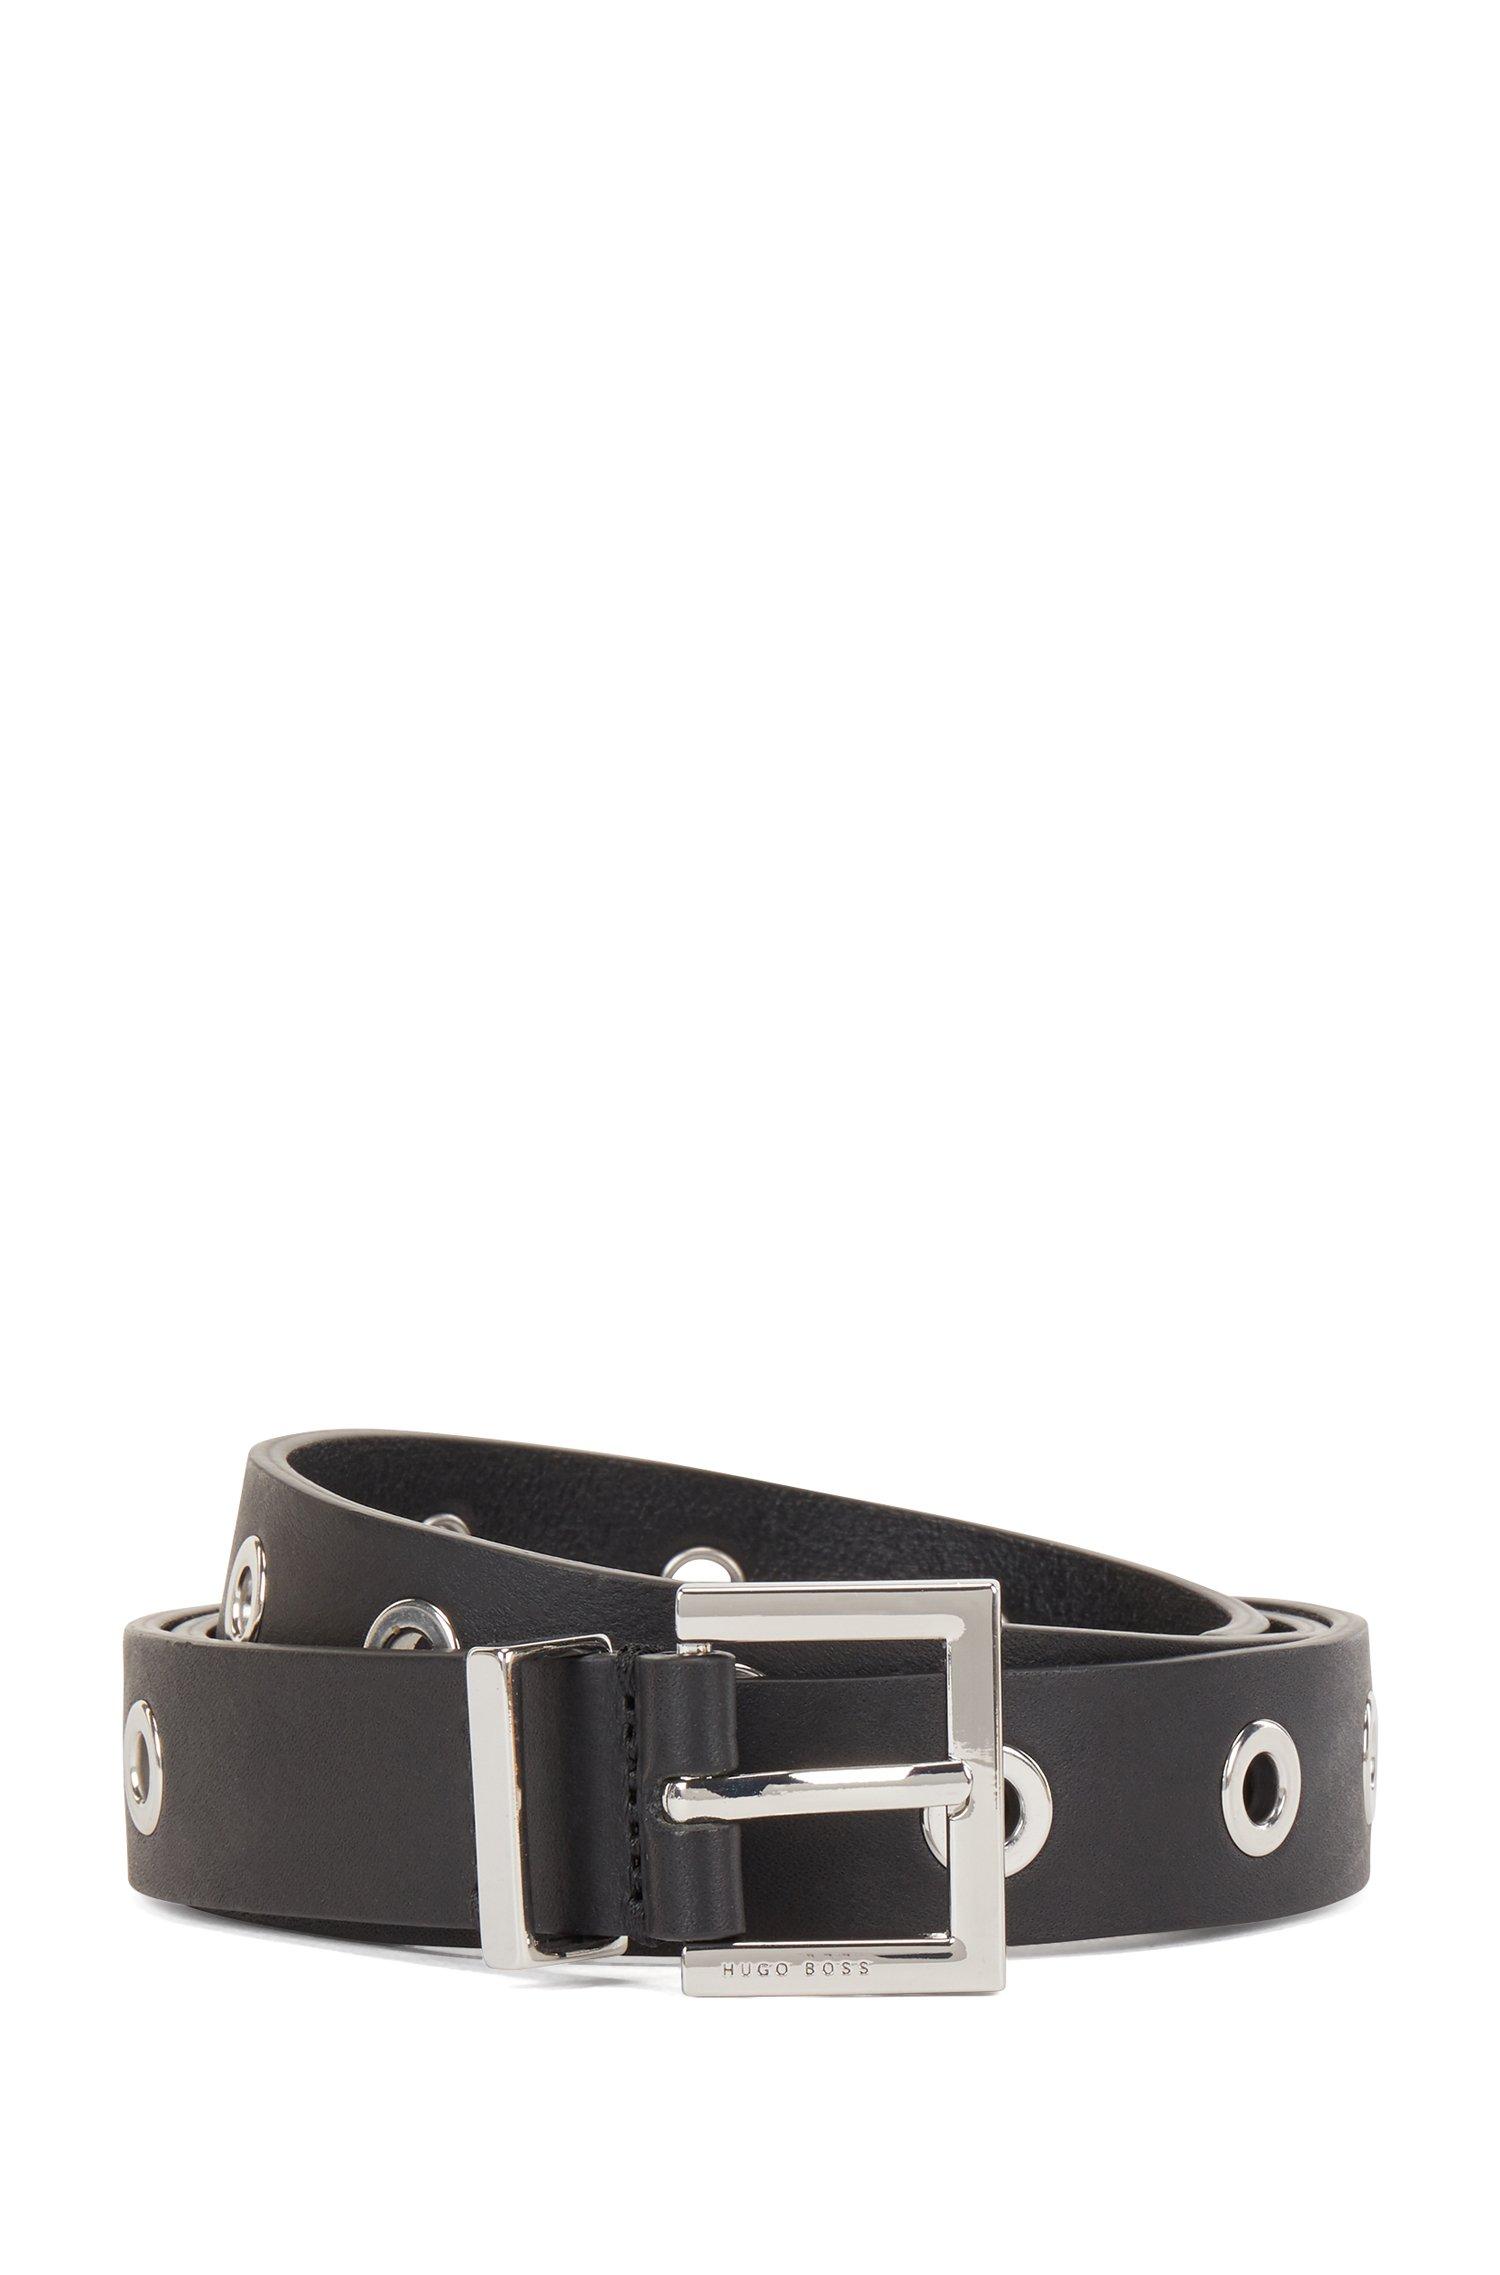 Pin-buckle belt in Italian leather with metallic eyelets, Black